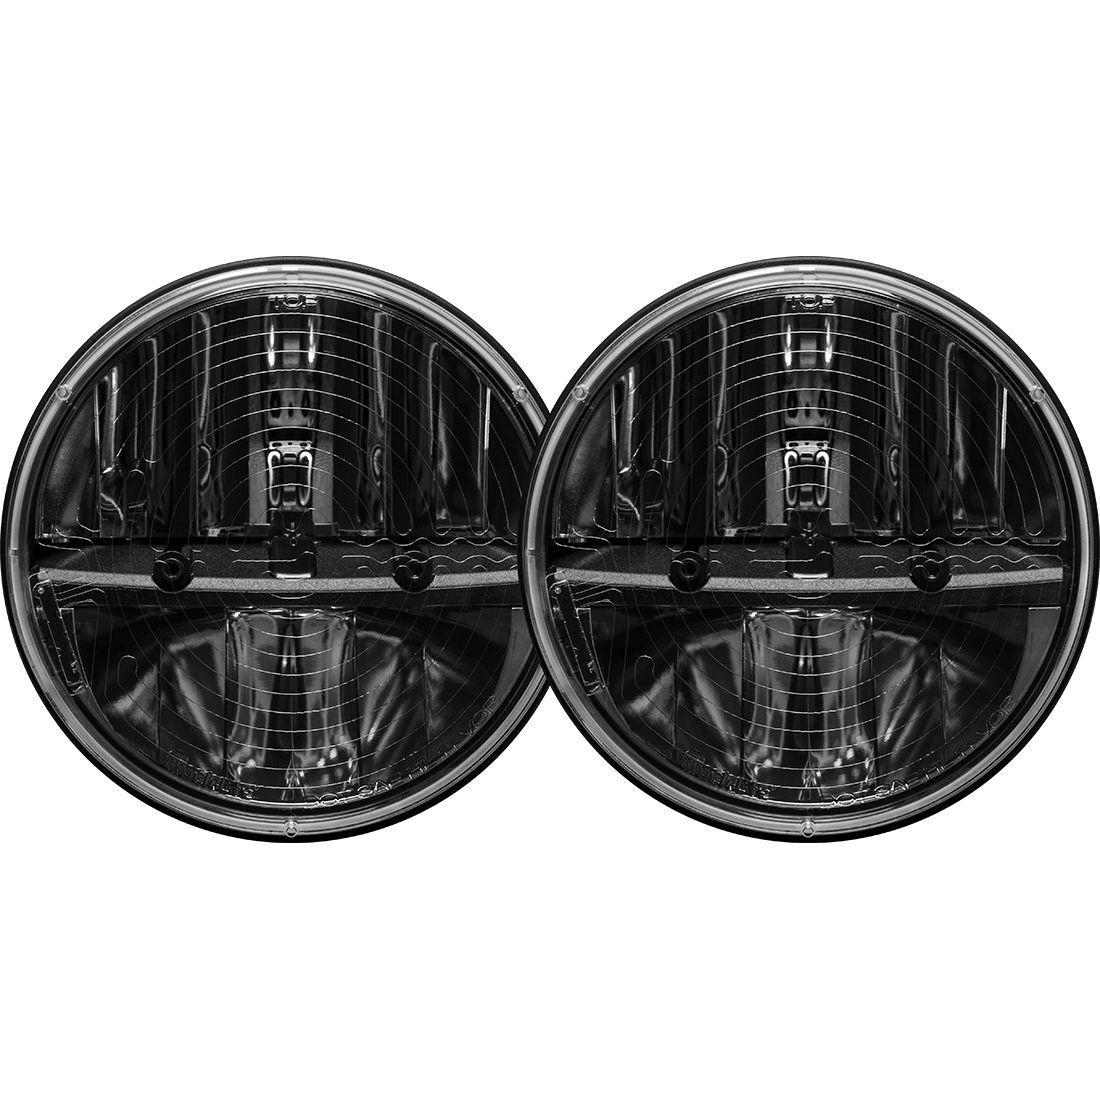 Rigid Industries 7in Round Heated Headlight Non-JK